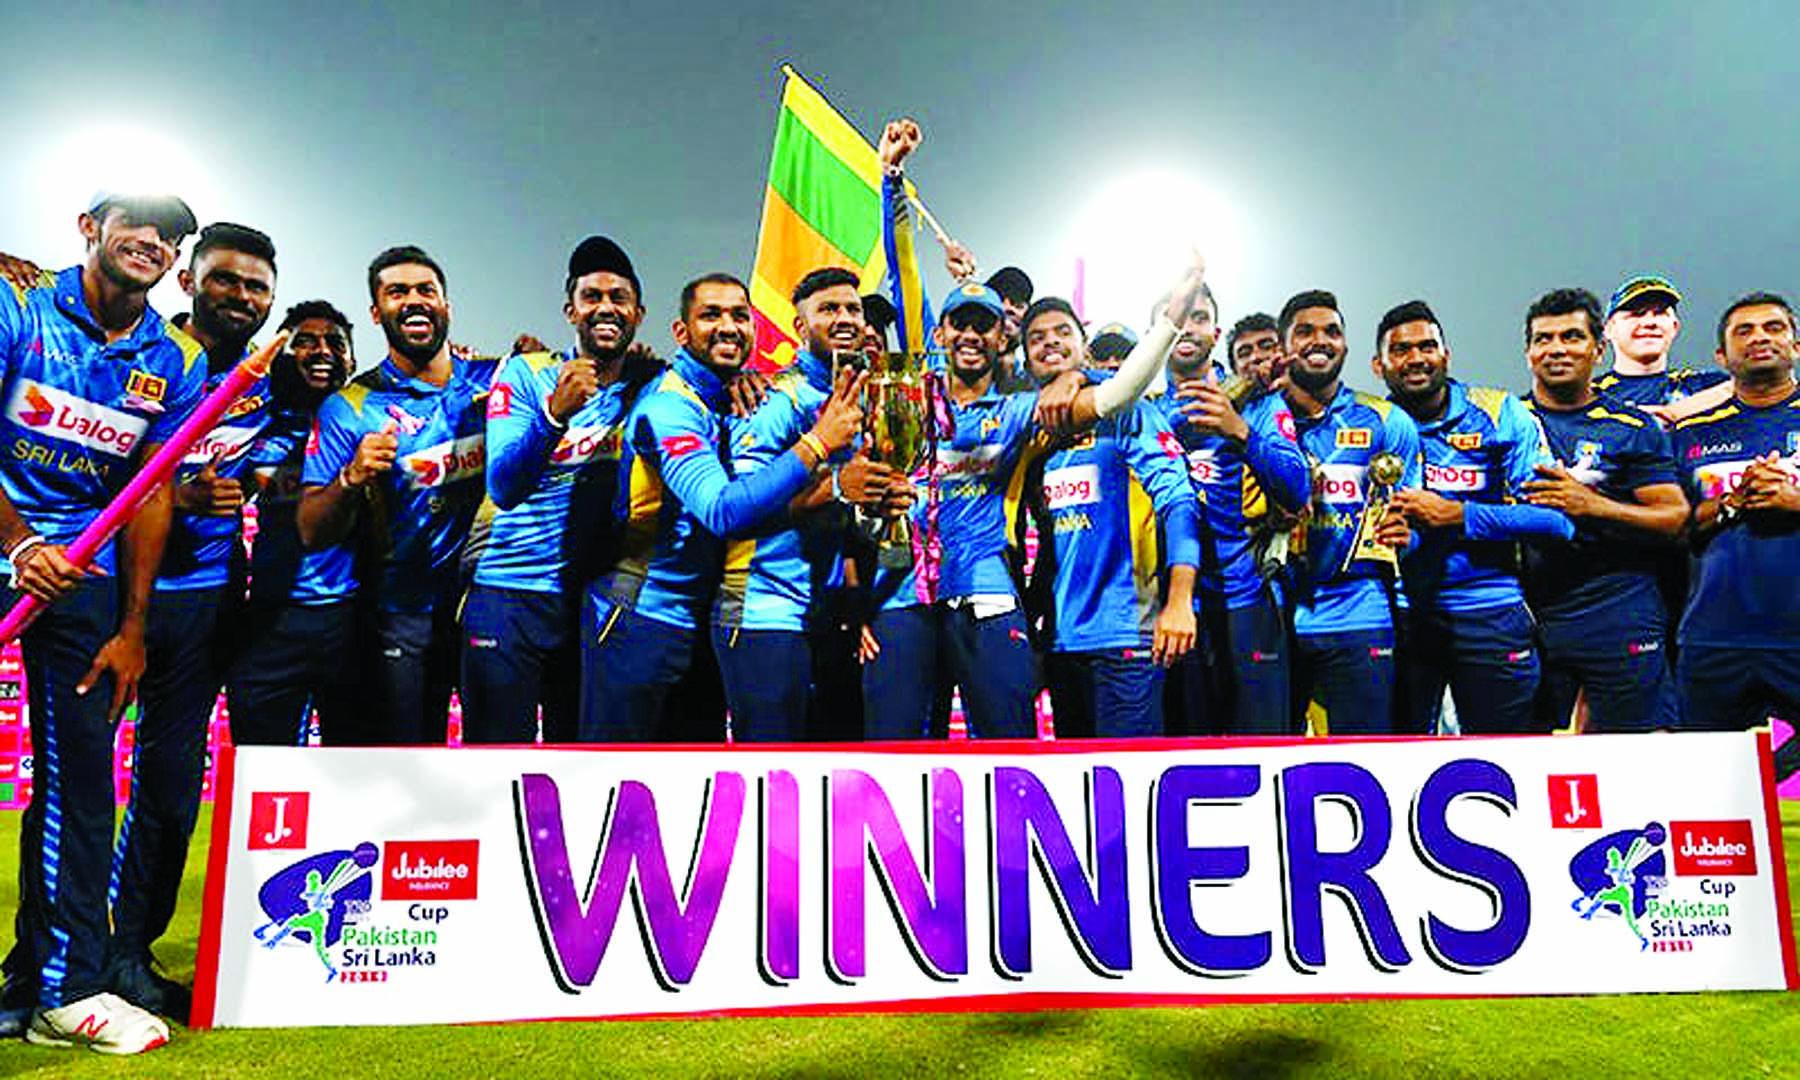 Hasaranga, Fernando star as Sri Lanka whitewash Pakistan in T20 series